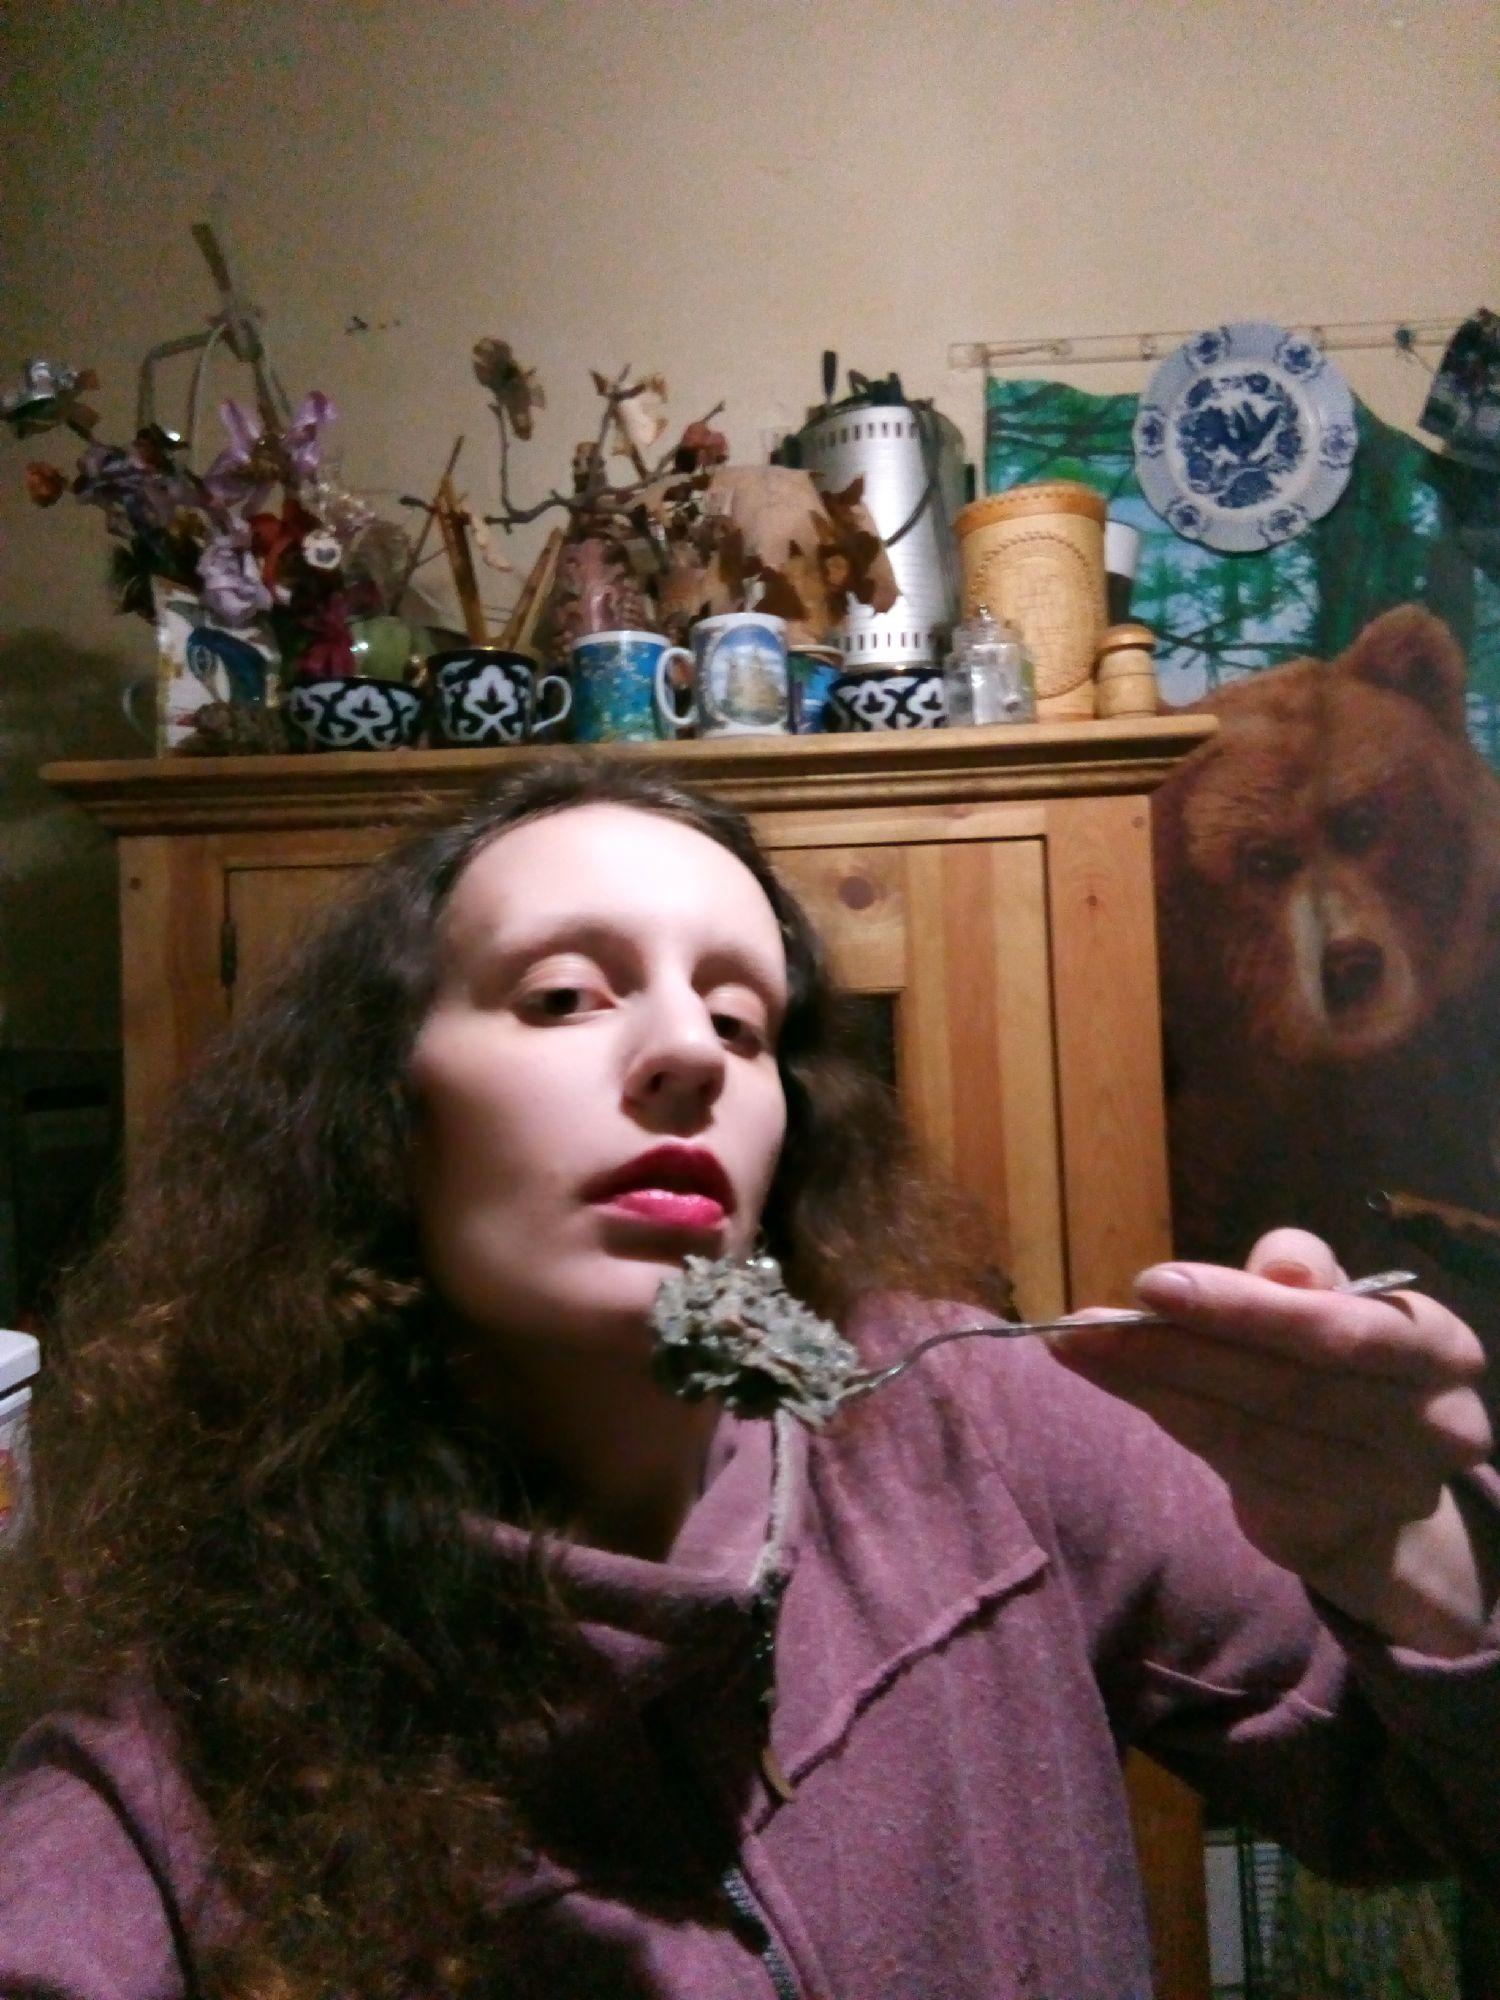 Пробуем блюдо. Шутка: на самом деле не вздумайте. Фото: ©SoLutova